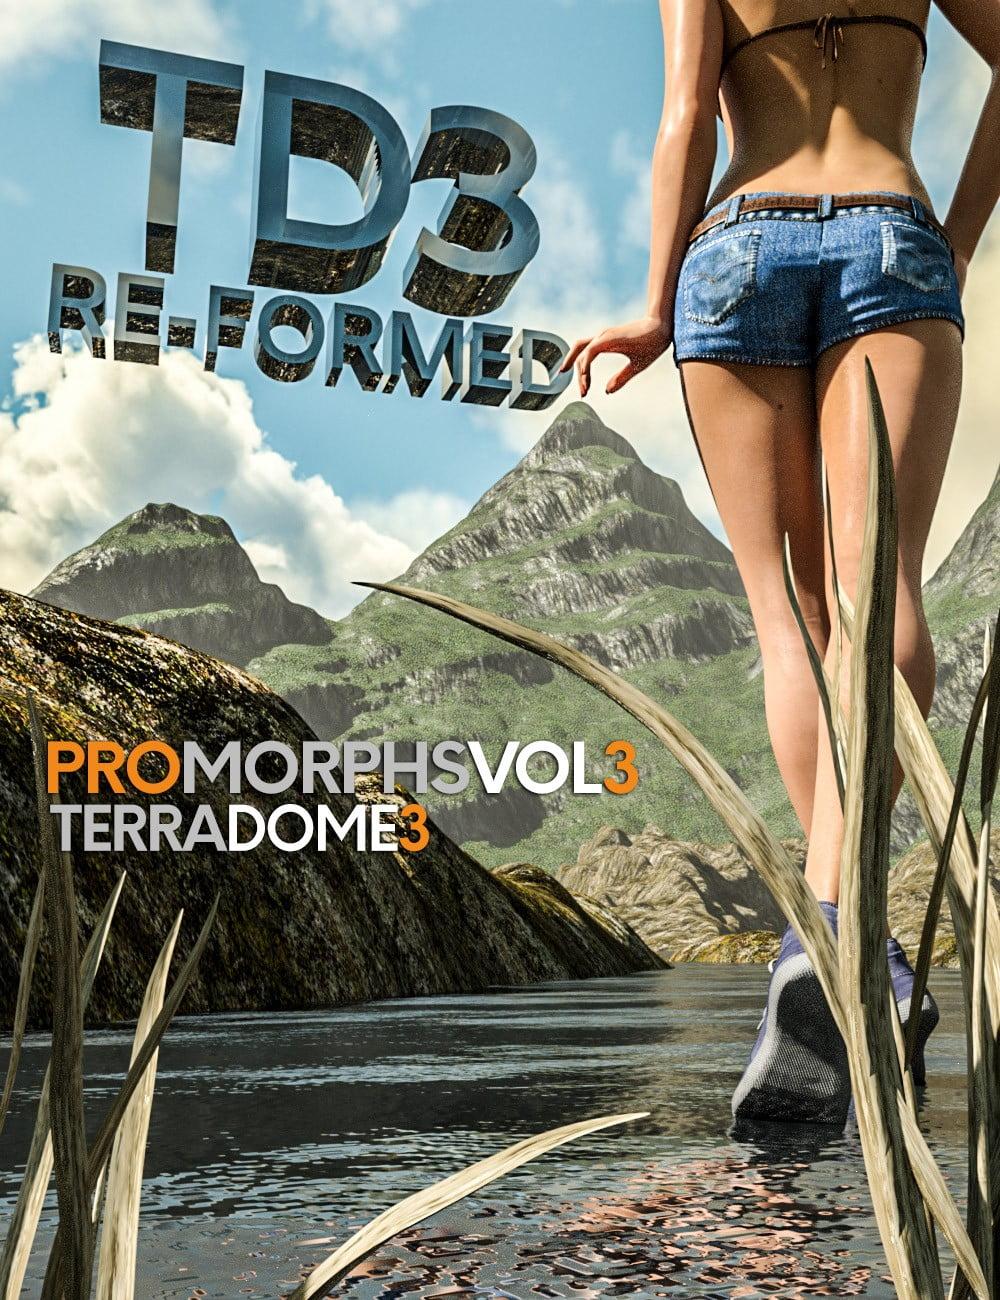 TerraDome 3 RE-FORMED - Pro Morphs Vol 3